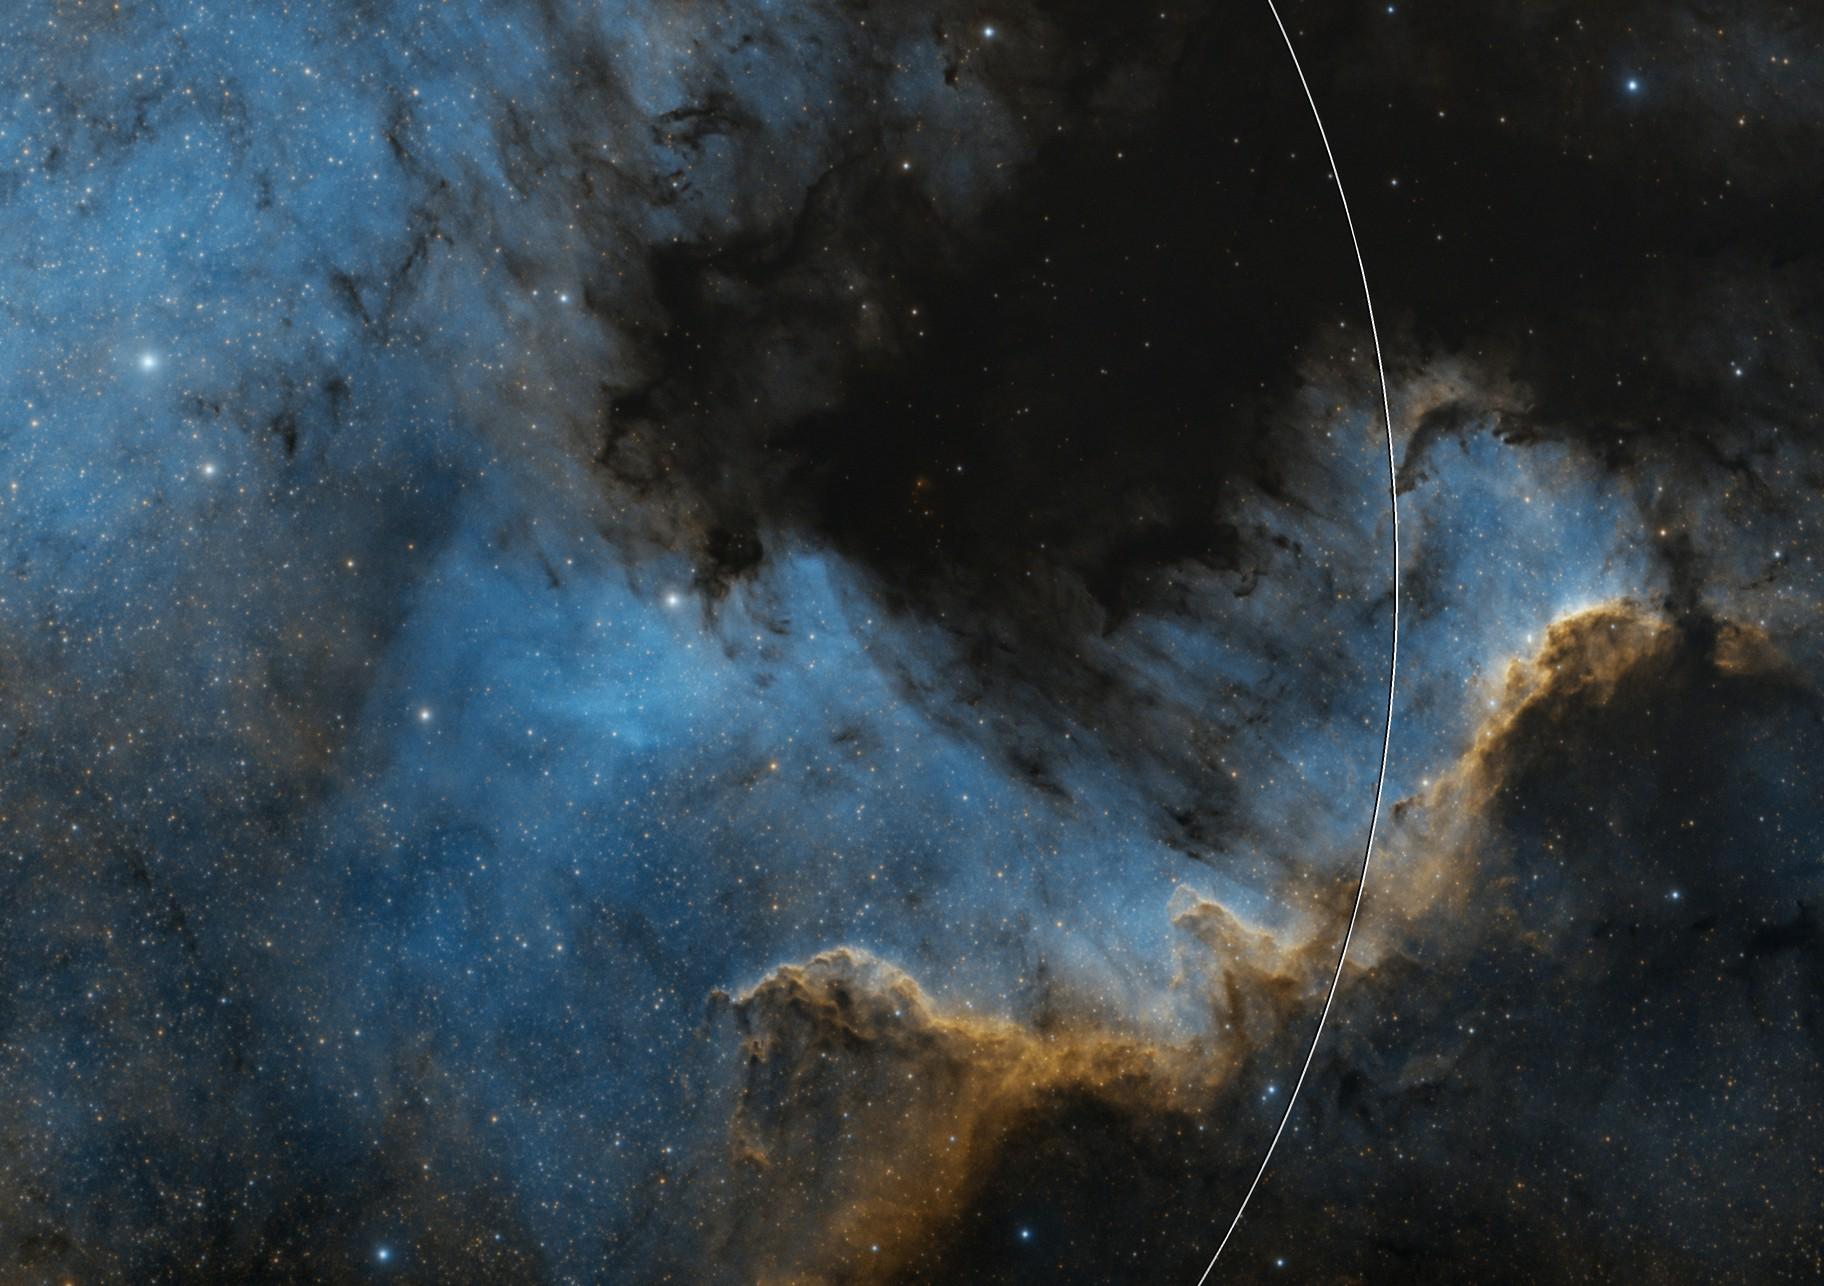 NGC 7000 North America Nebula / Cygnus Wall (SHO)